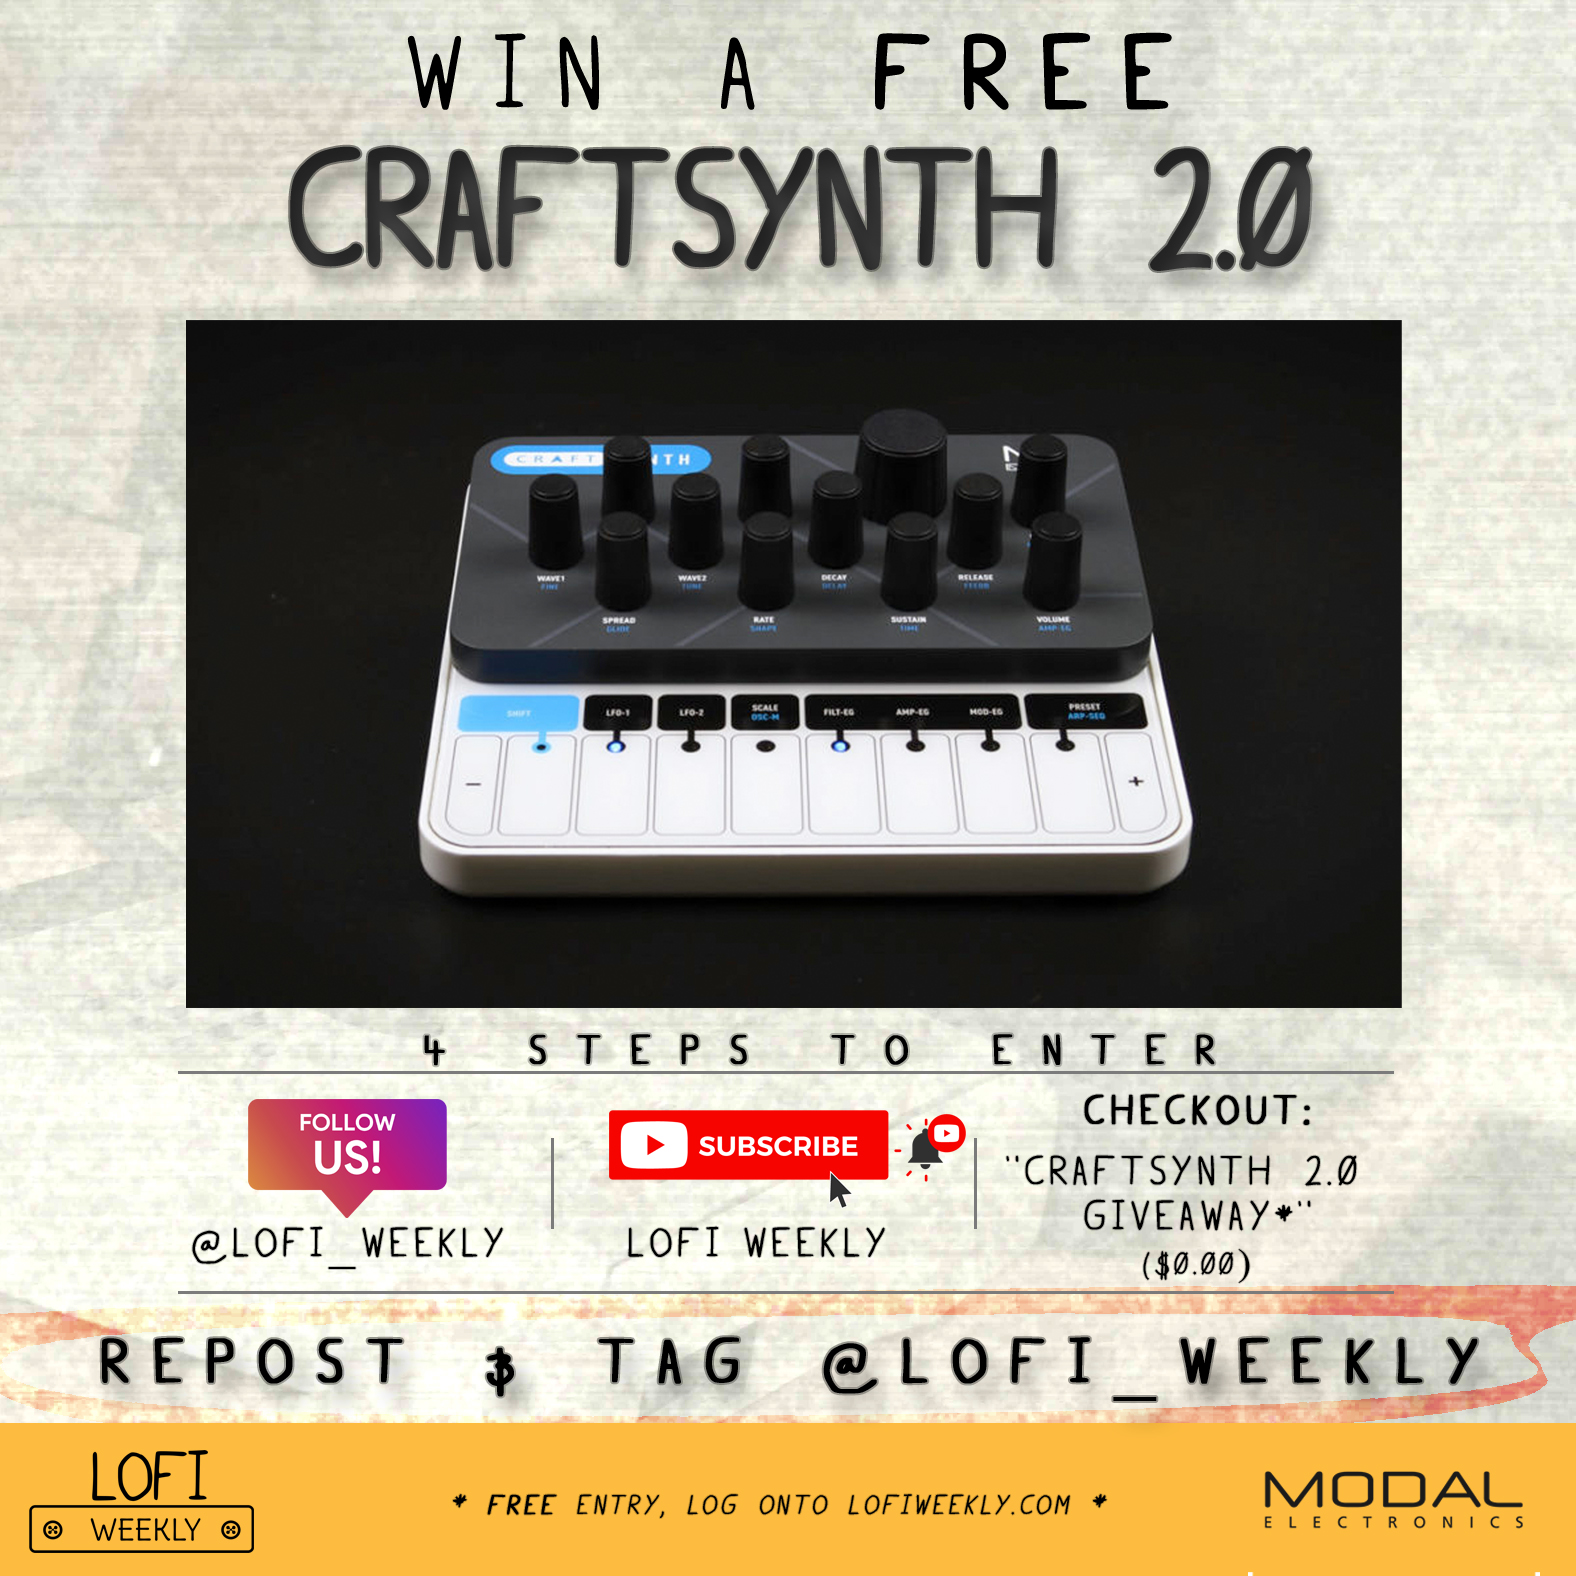 LoFi Weekly - CRAFTsynth 2.0 Modal Electronics Giveaway